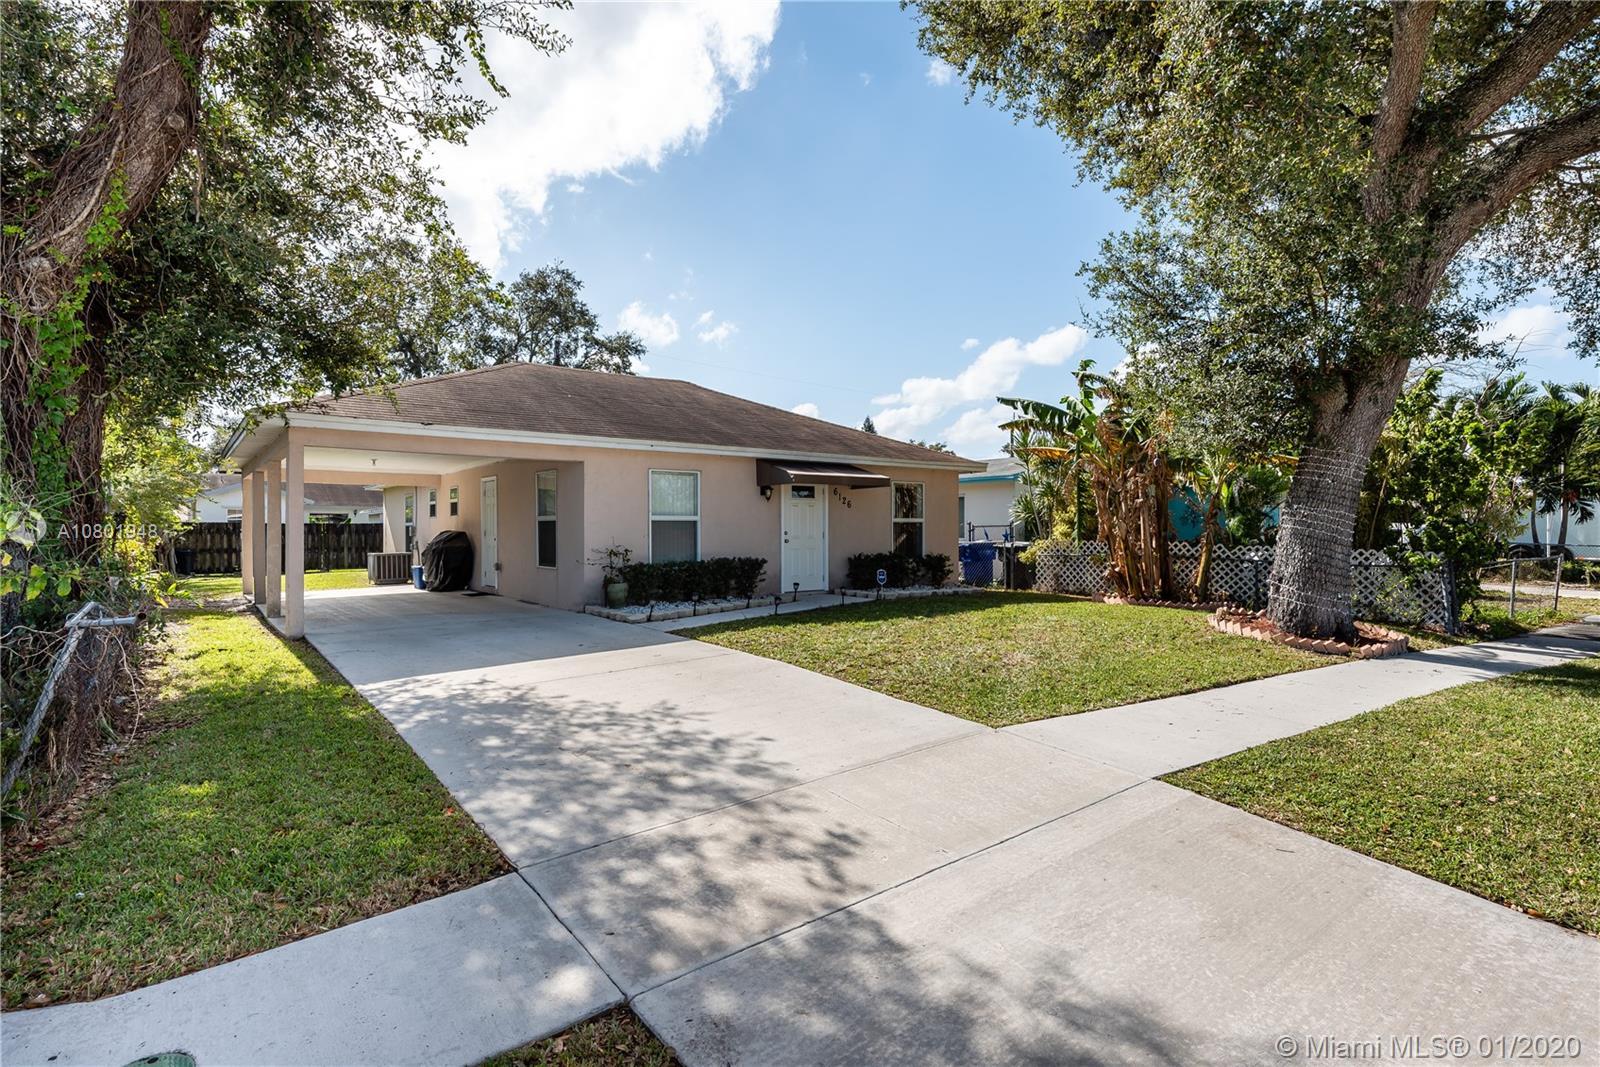 6126 Wiley St, Hollywood, FL 33023 - Hollywood, FL real estate listing